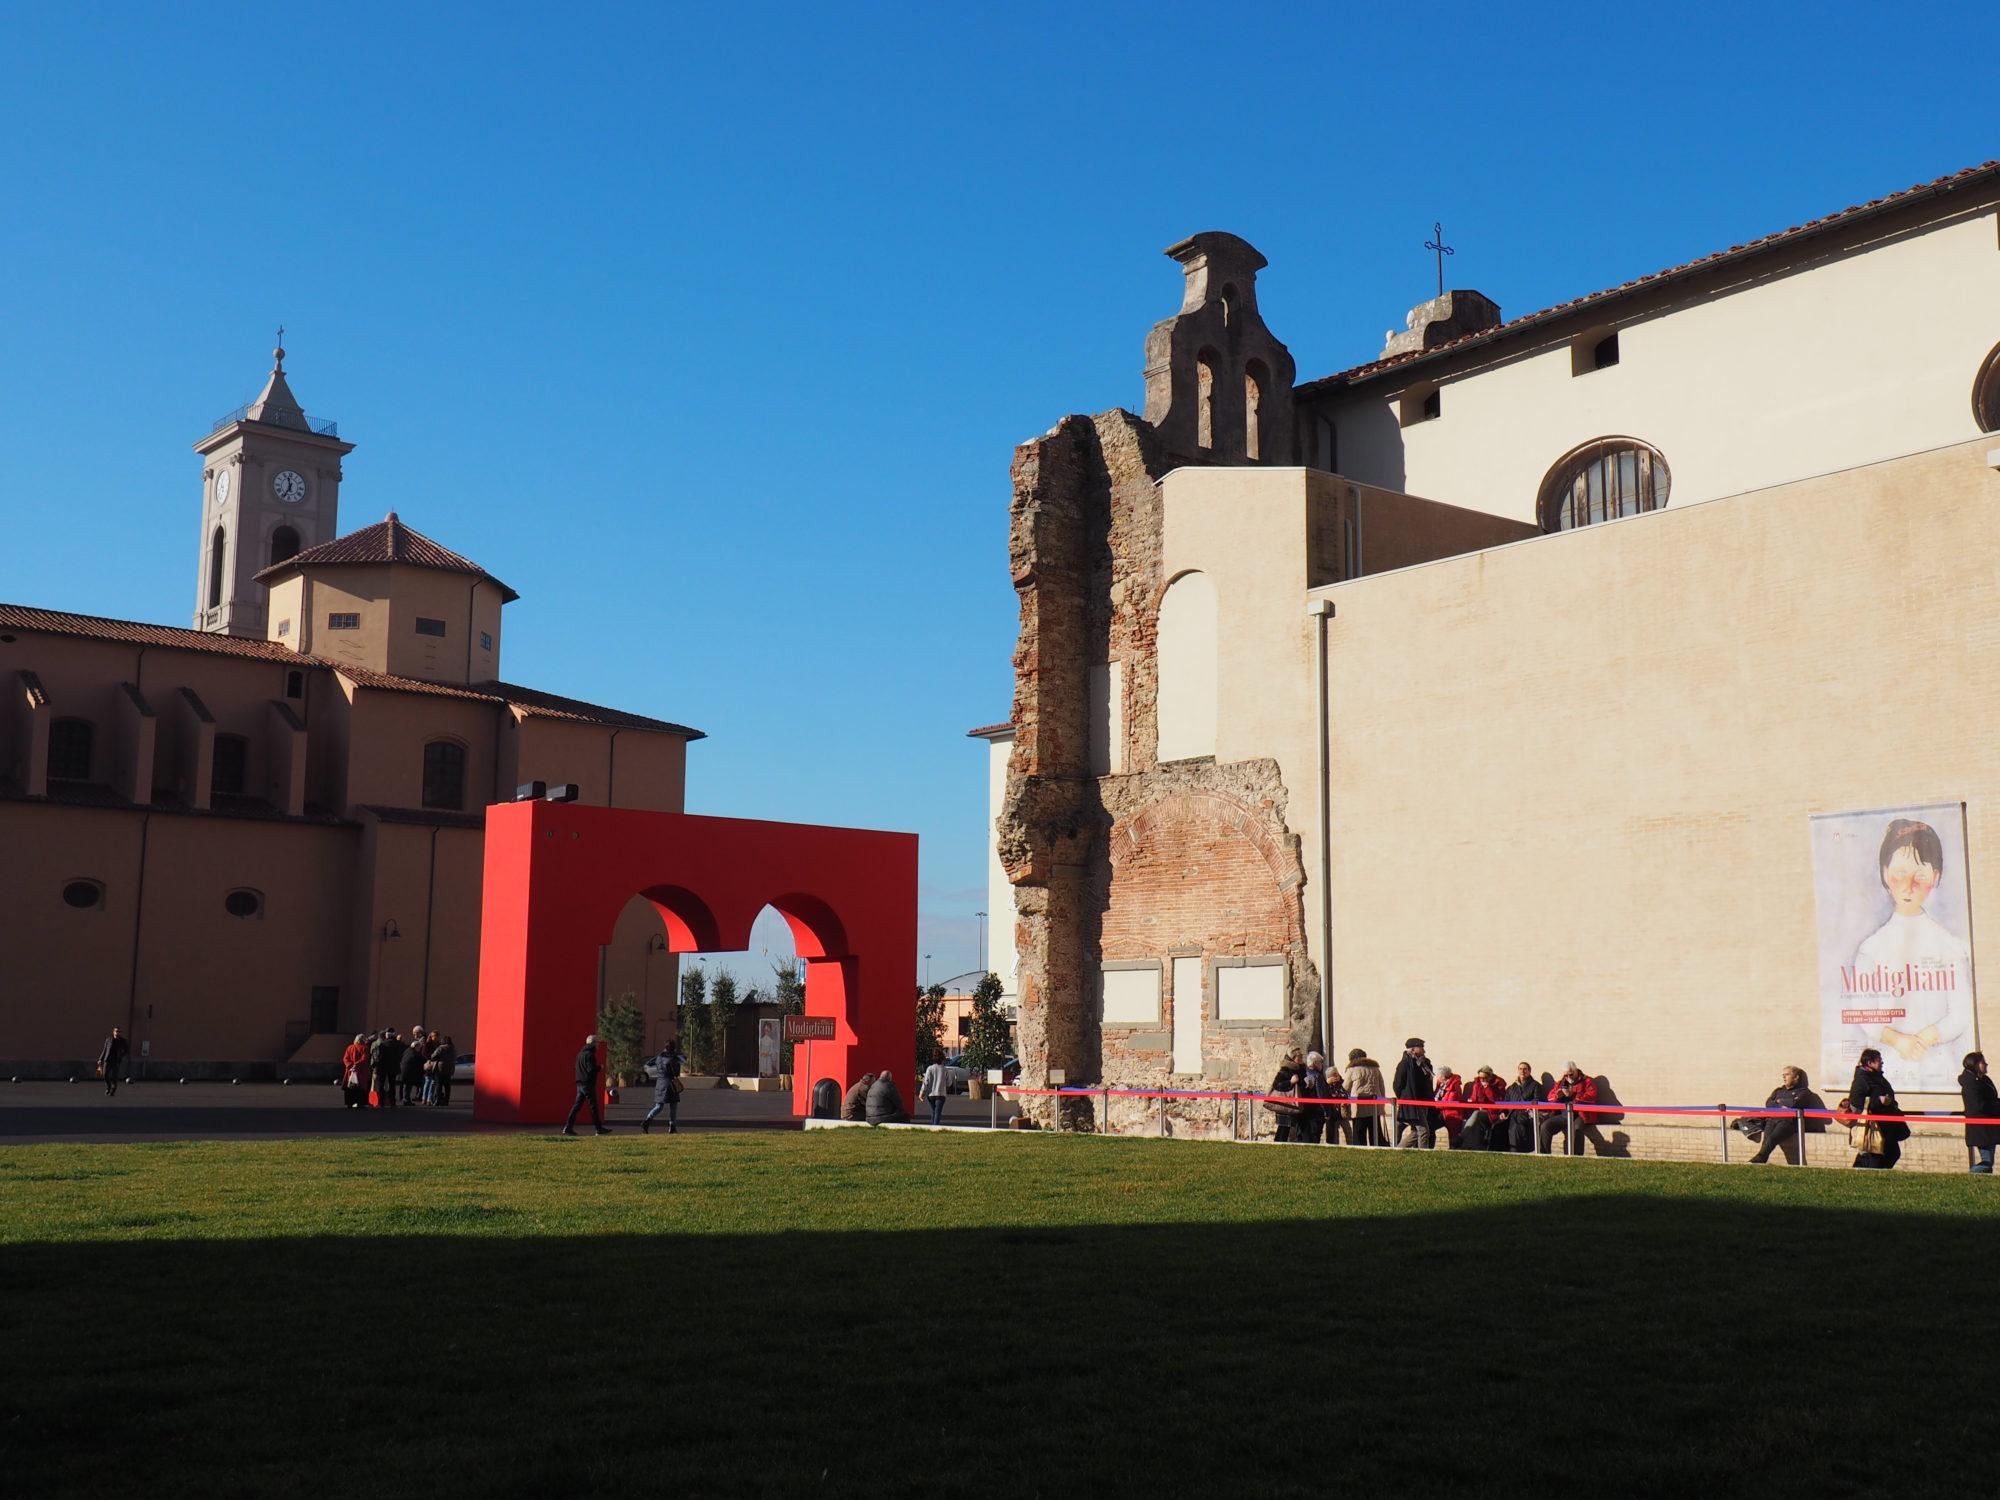 Modigliani 100 anni